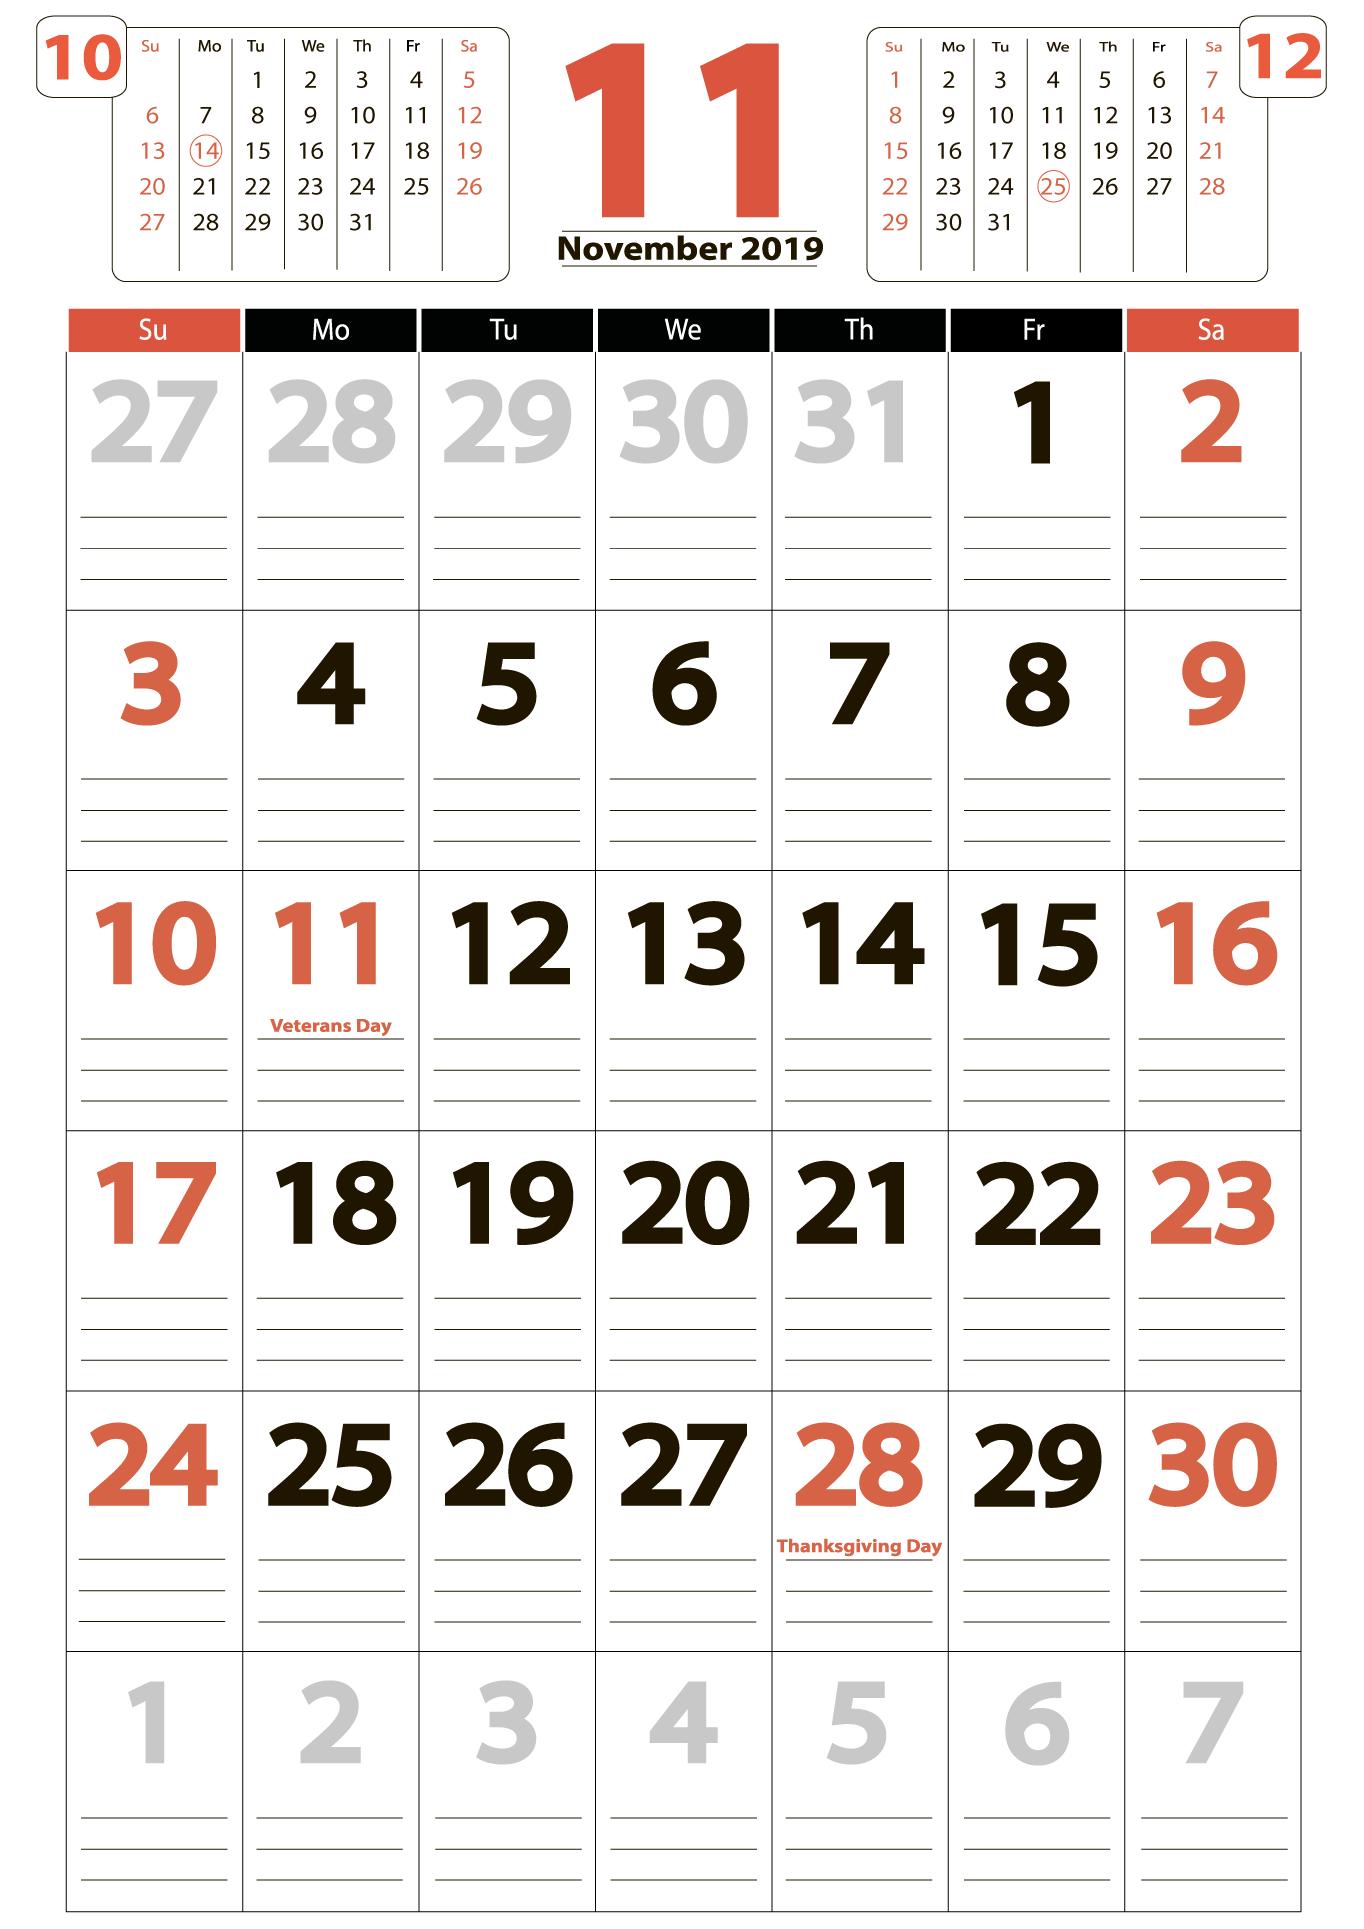 November 2019 big calendar